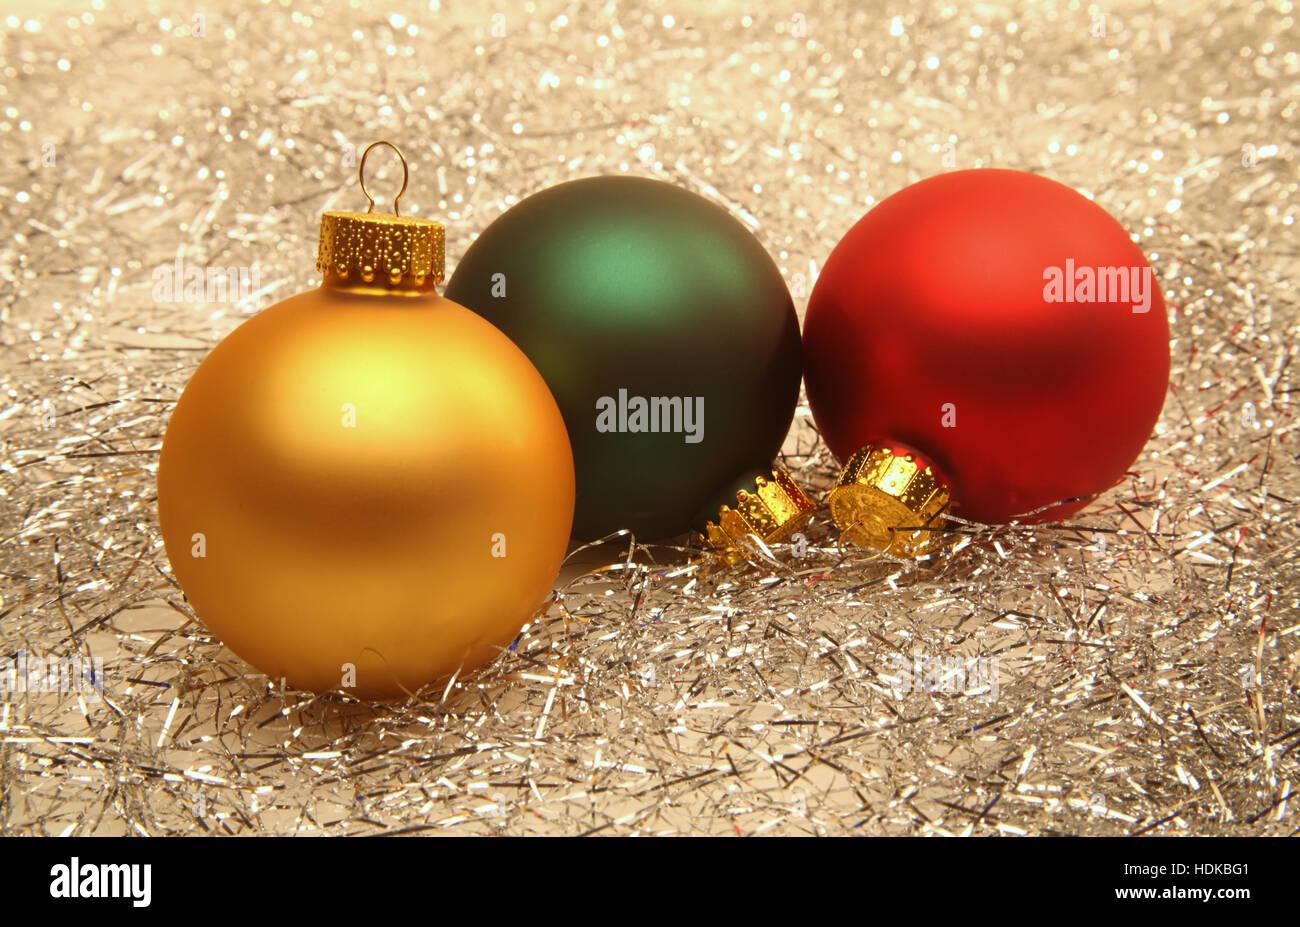 Christmas ornaments and tinsel - Stock Image